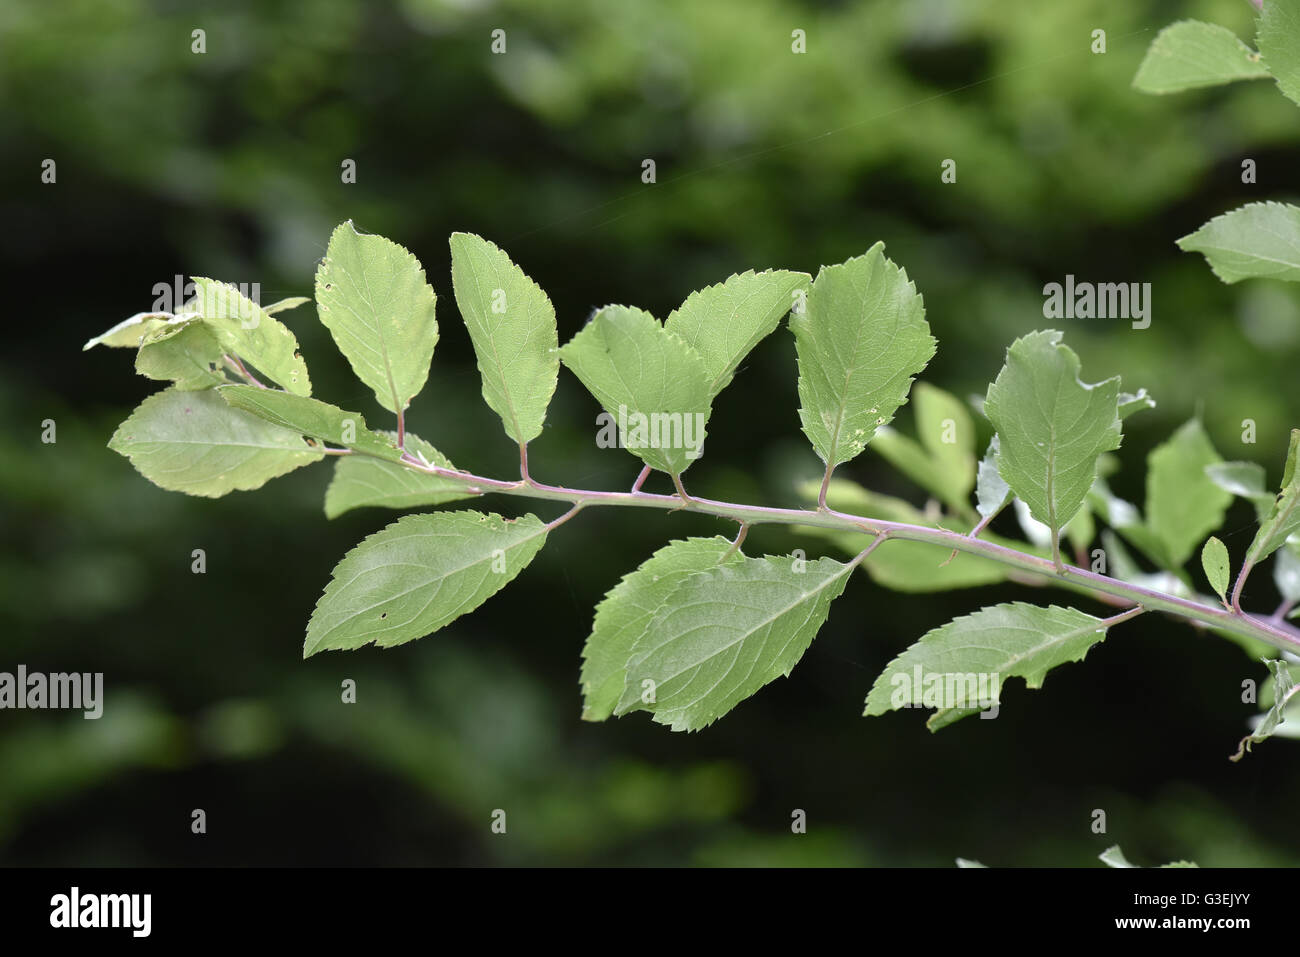 Blackthorn - Prunus spinosa - Stock Image